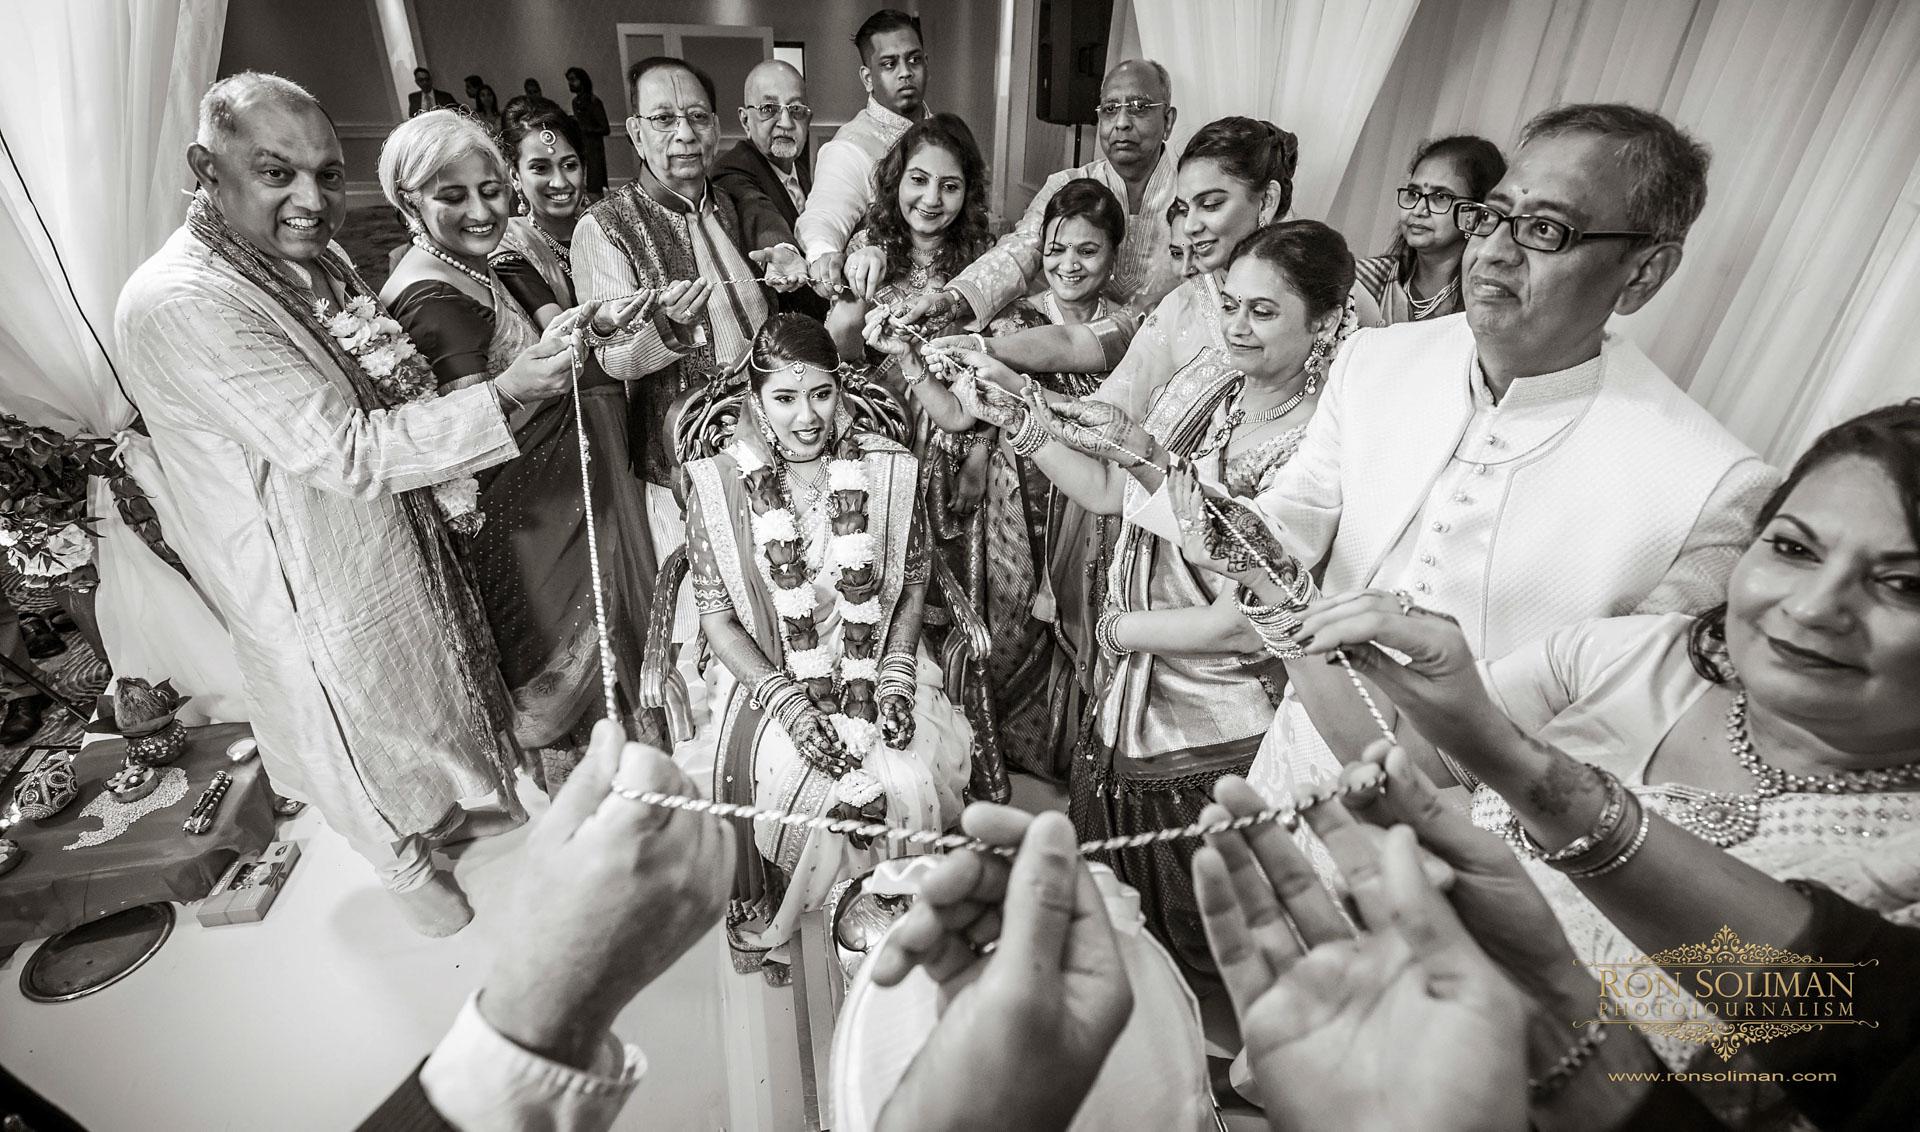 THE MARIGOLD NJ WEDDING 10